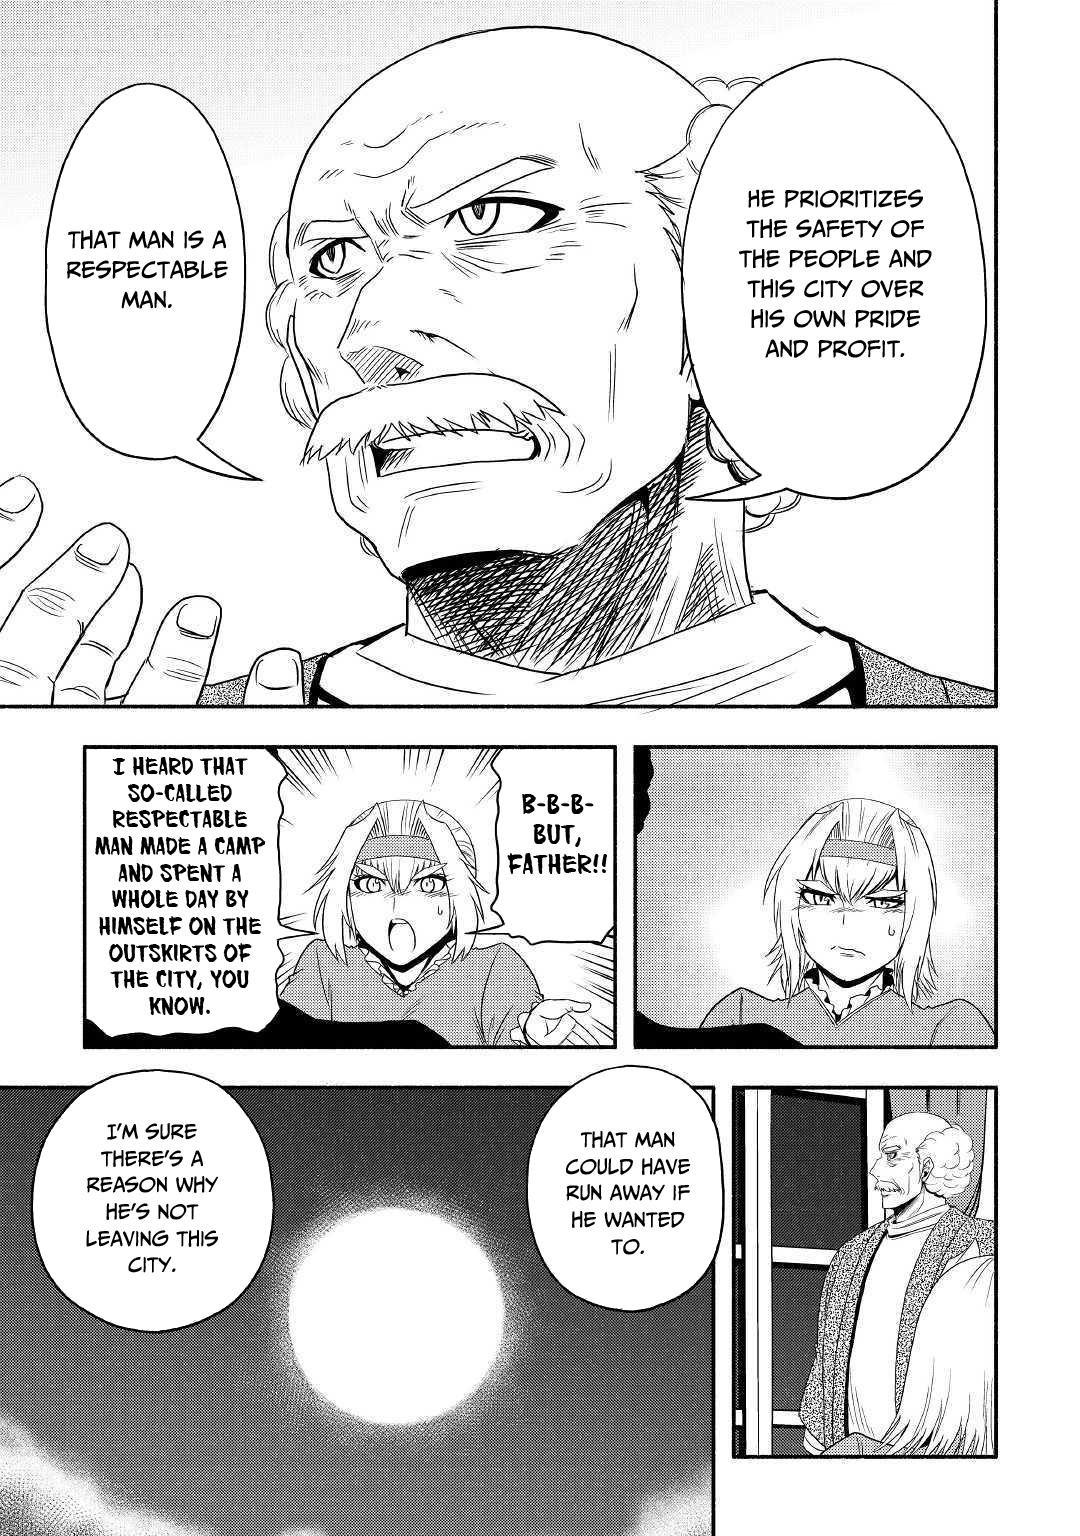 Manga Isekai ni Tobasareta Ossan wa Doko e Iku? - Chapter 28 Page 22